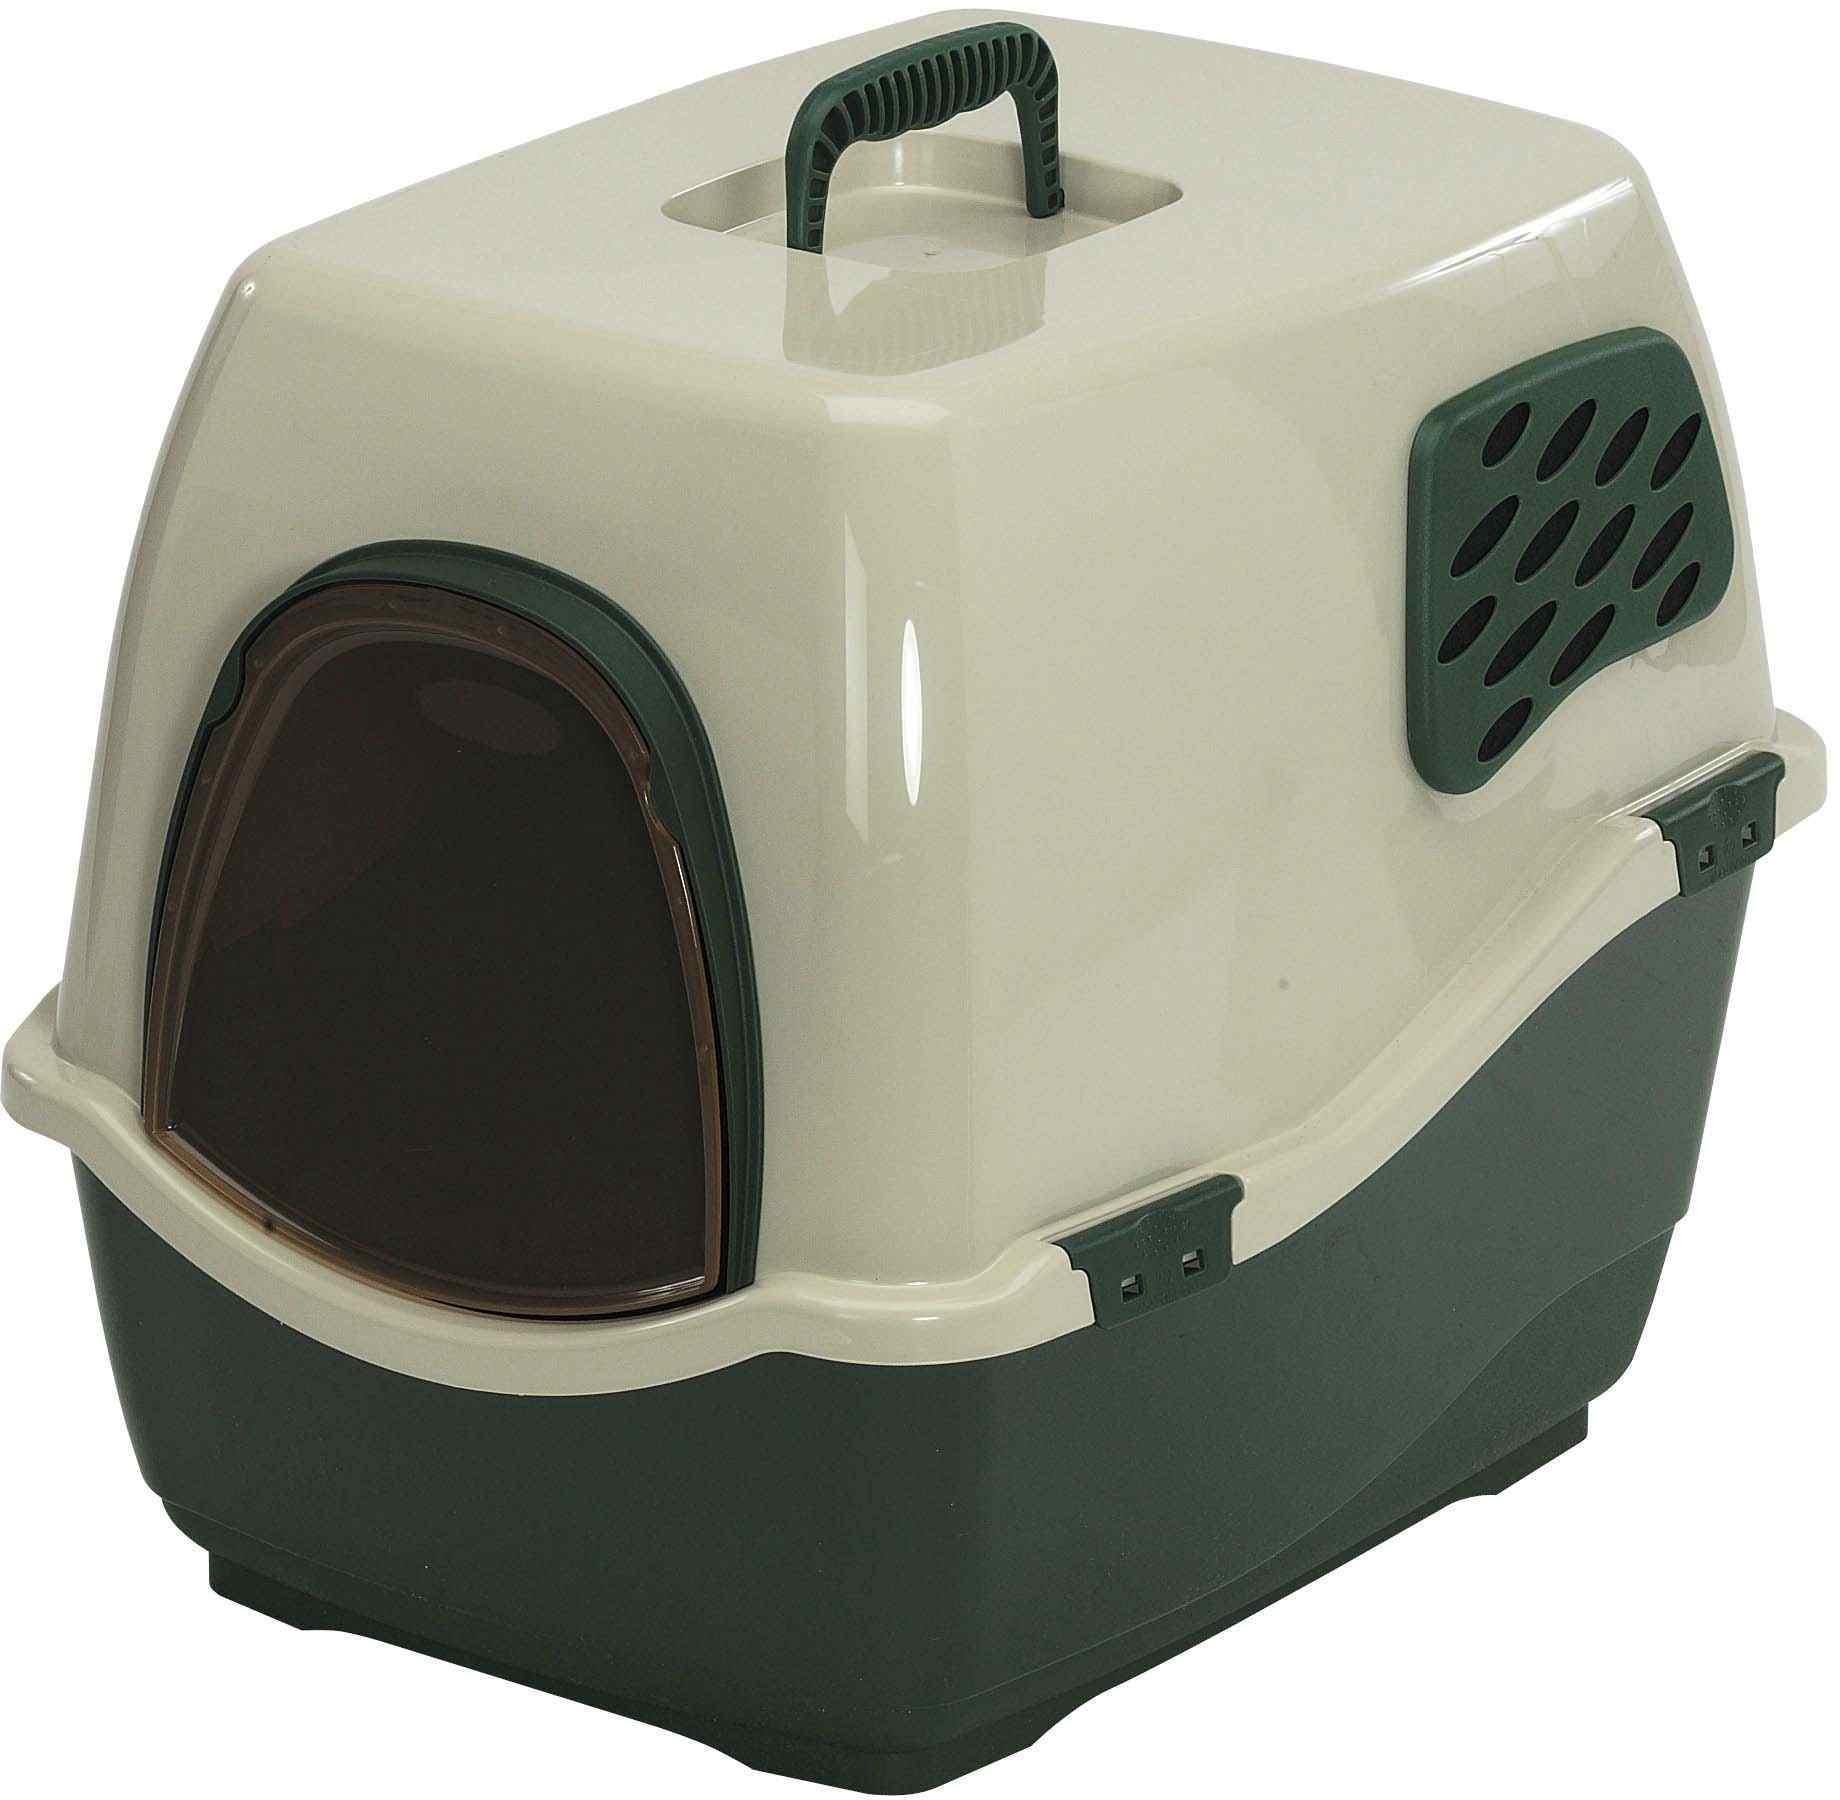 Био-туалет Marchioro BILL 1F для кошек